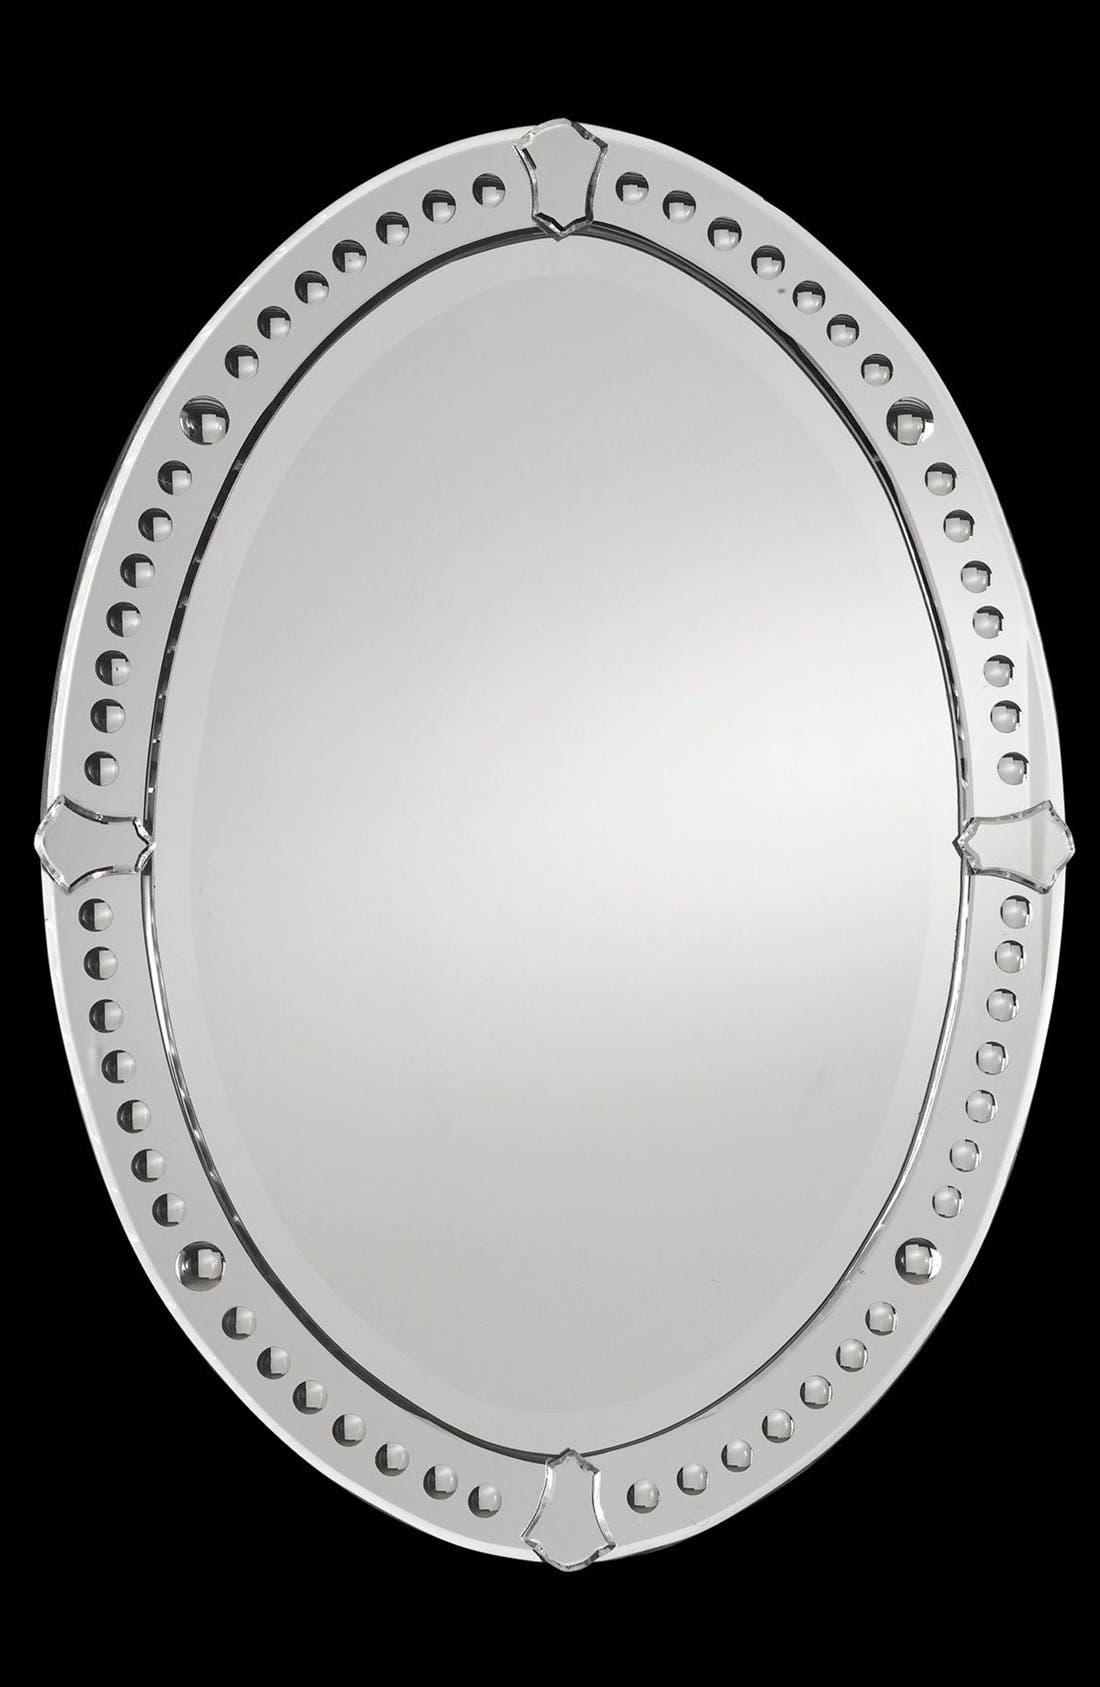 'Graziano' Frameless Oval Mirror,                             Alternate thumbnail 5, color,                             200